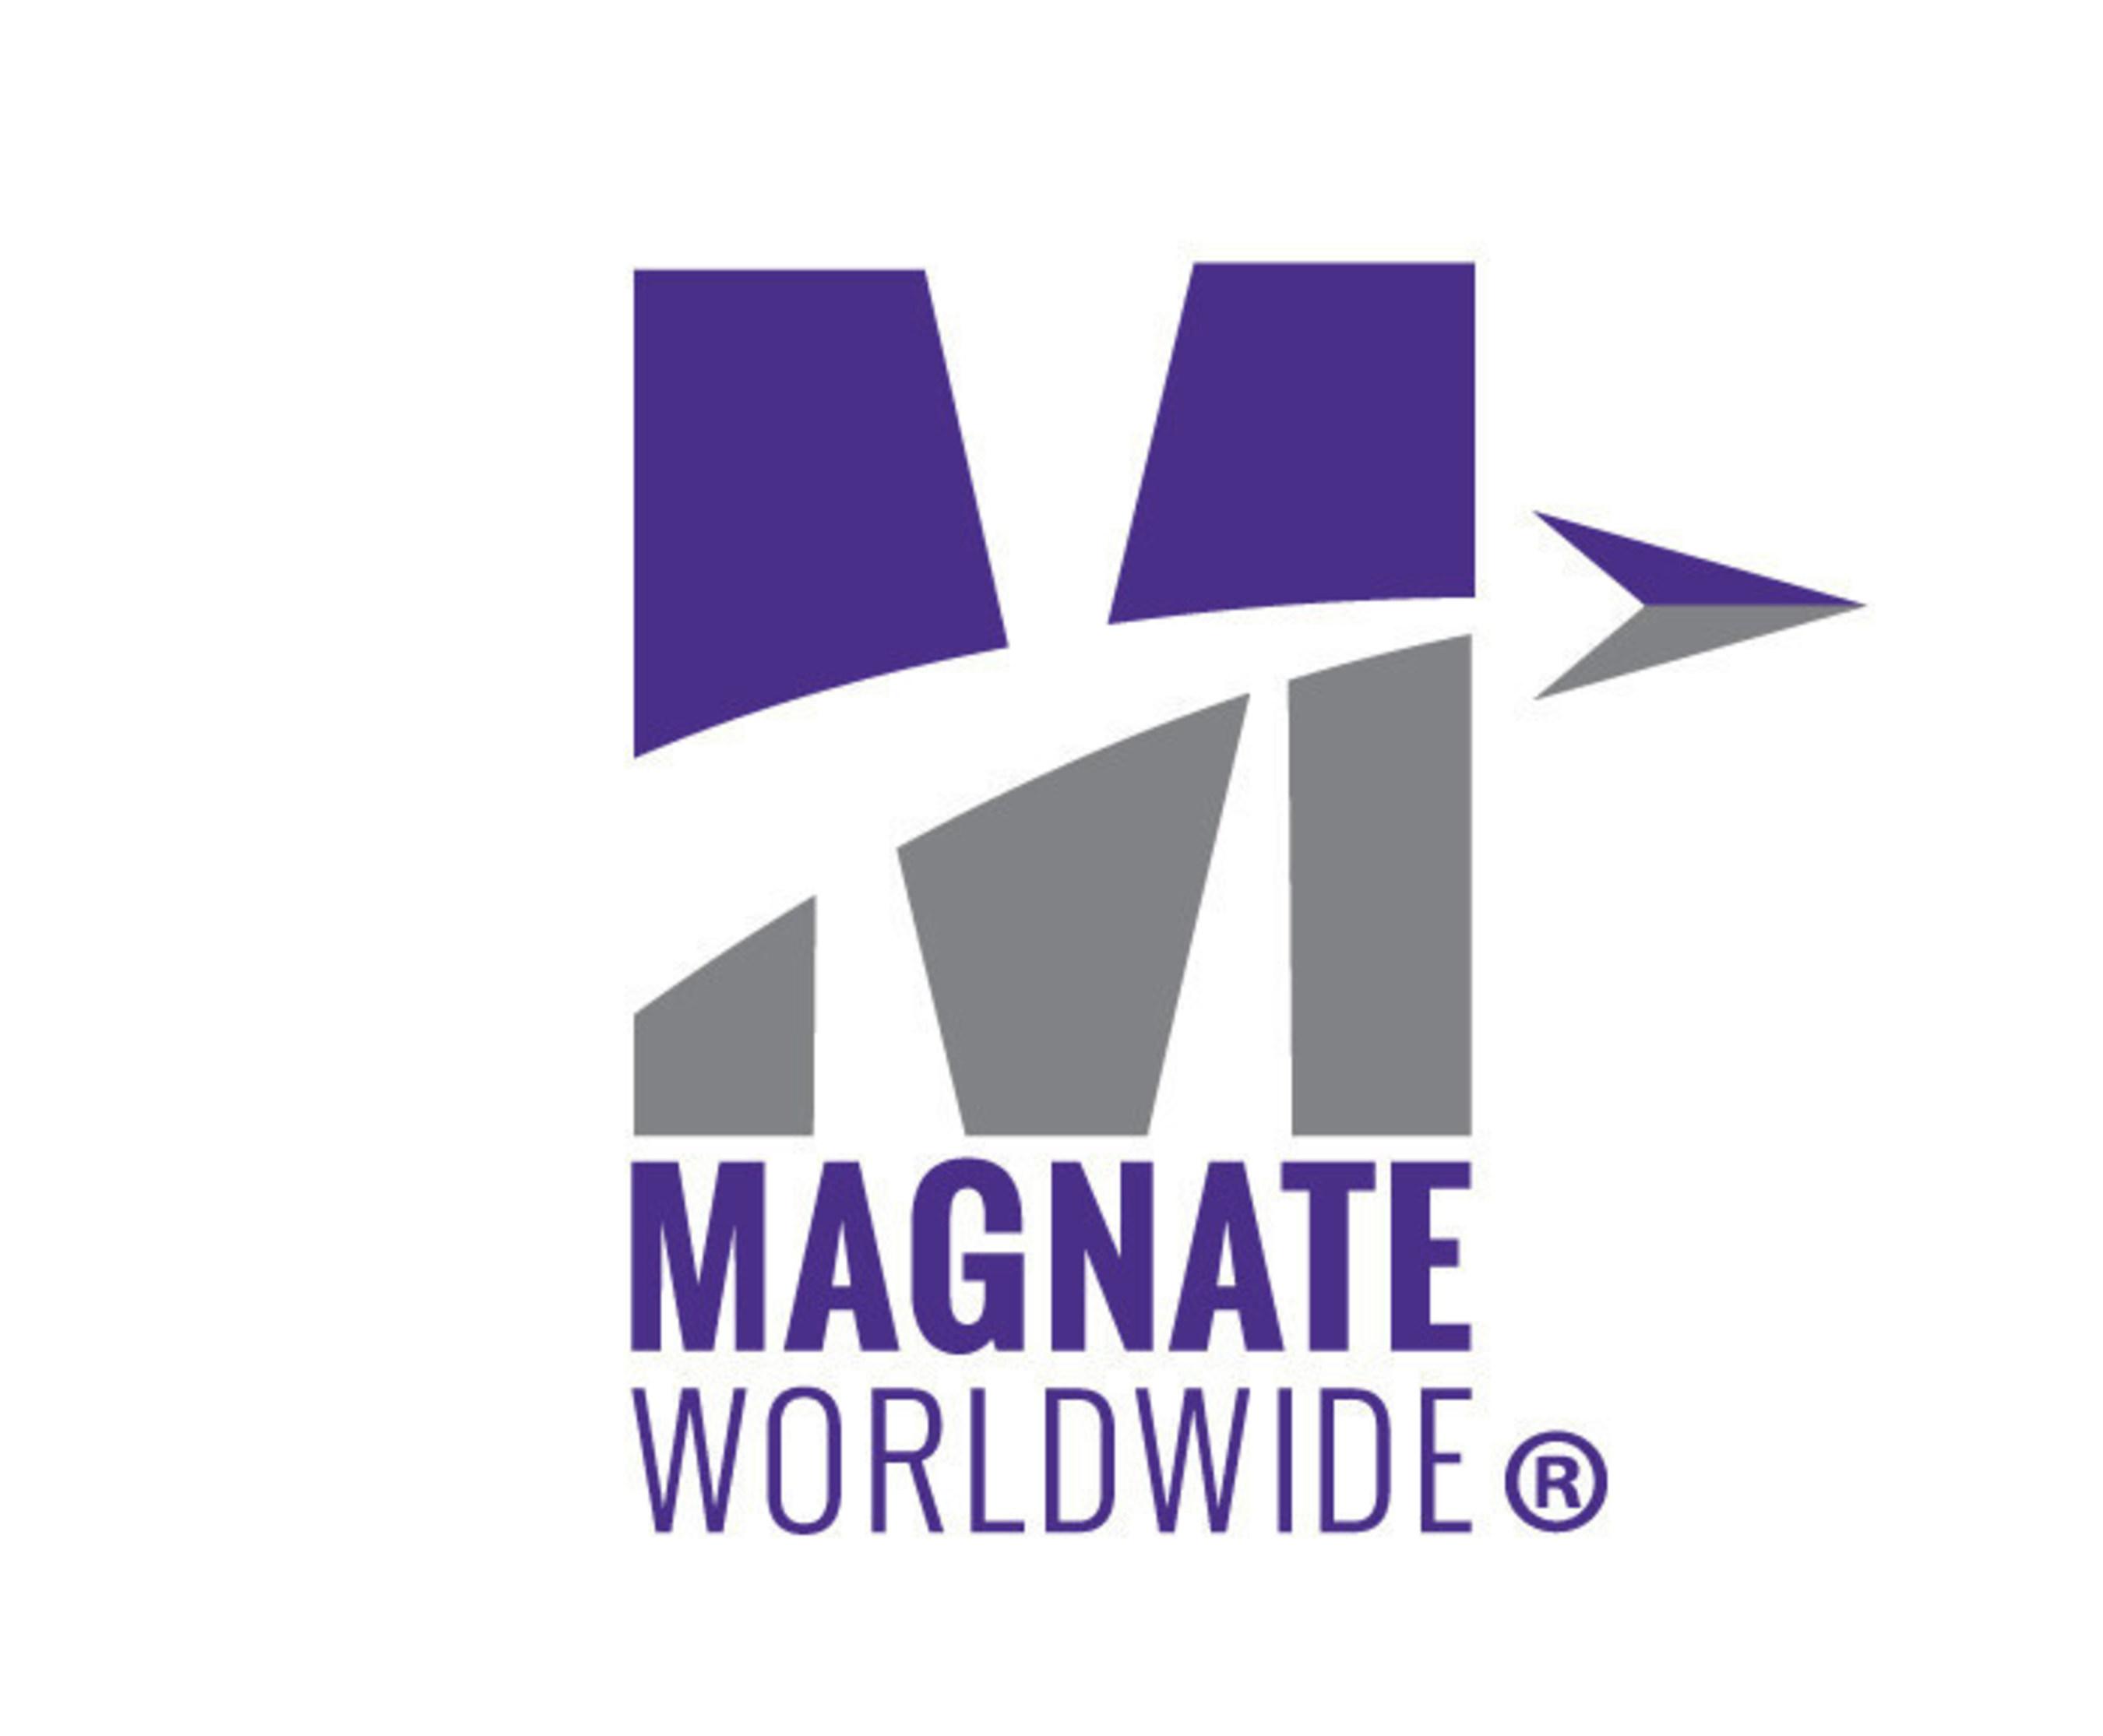 Magnate Worldwide (MWW) is building a premium logistics provider.